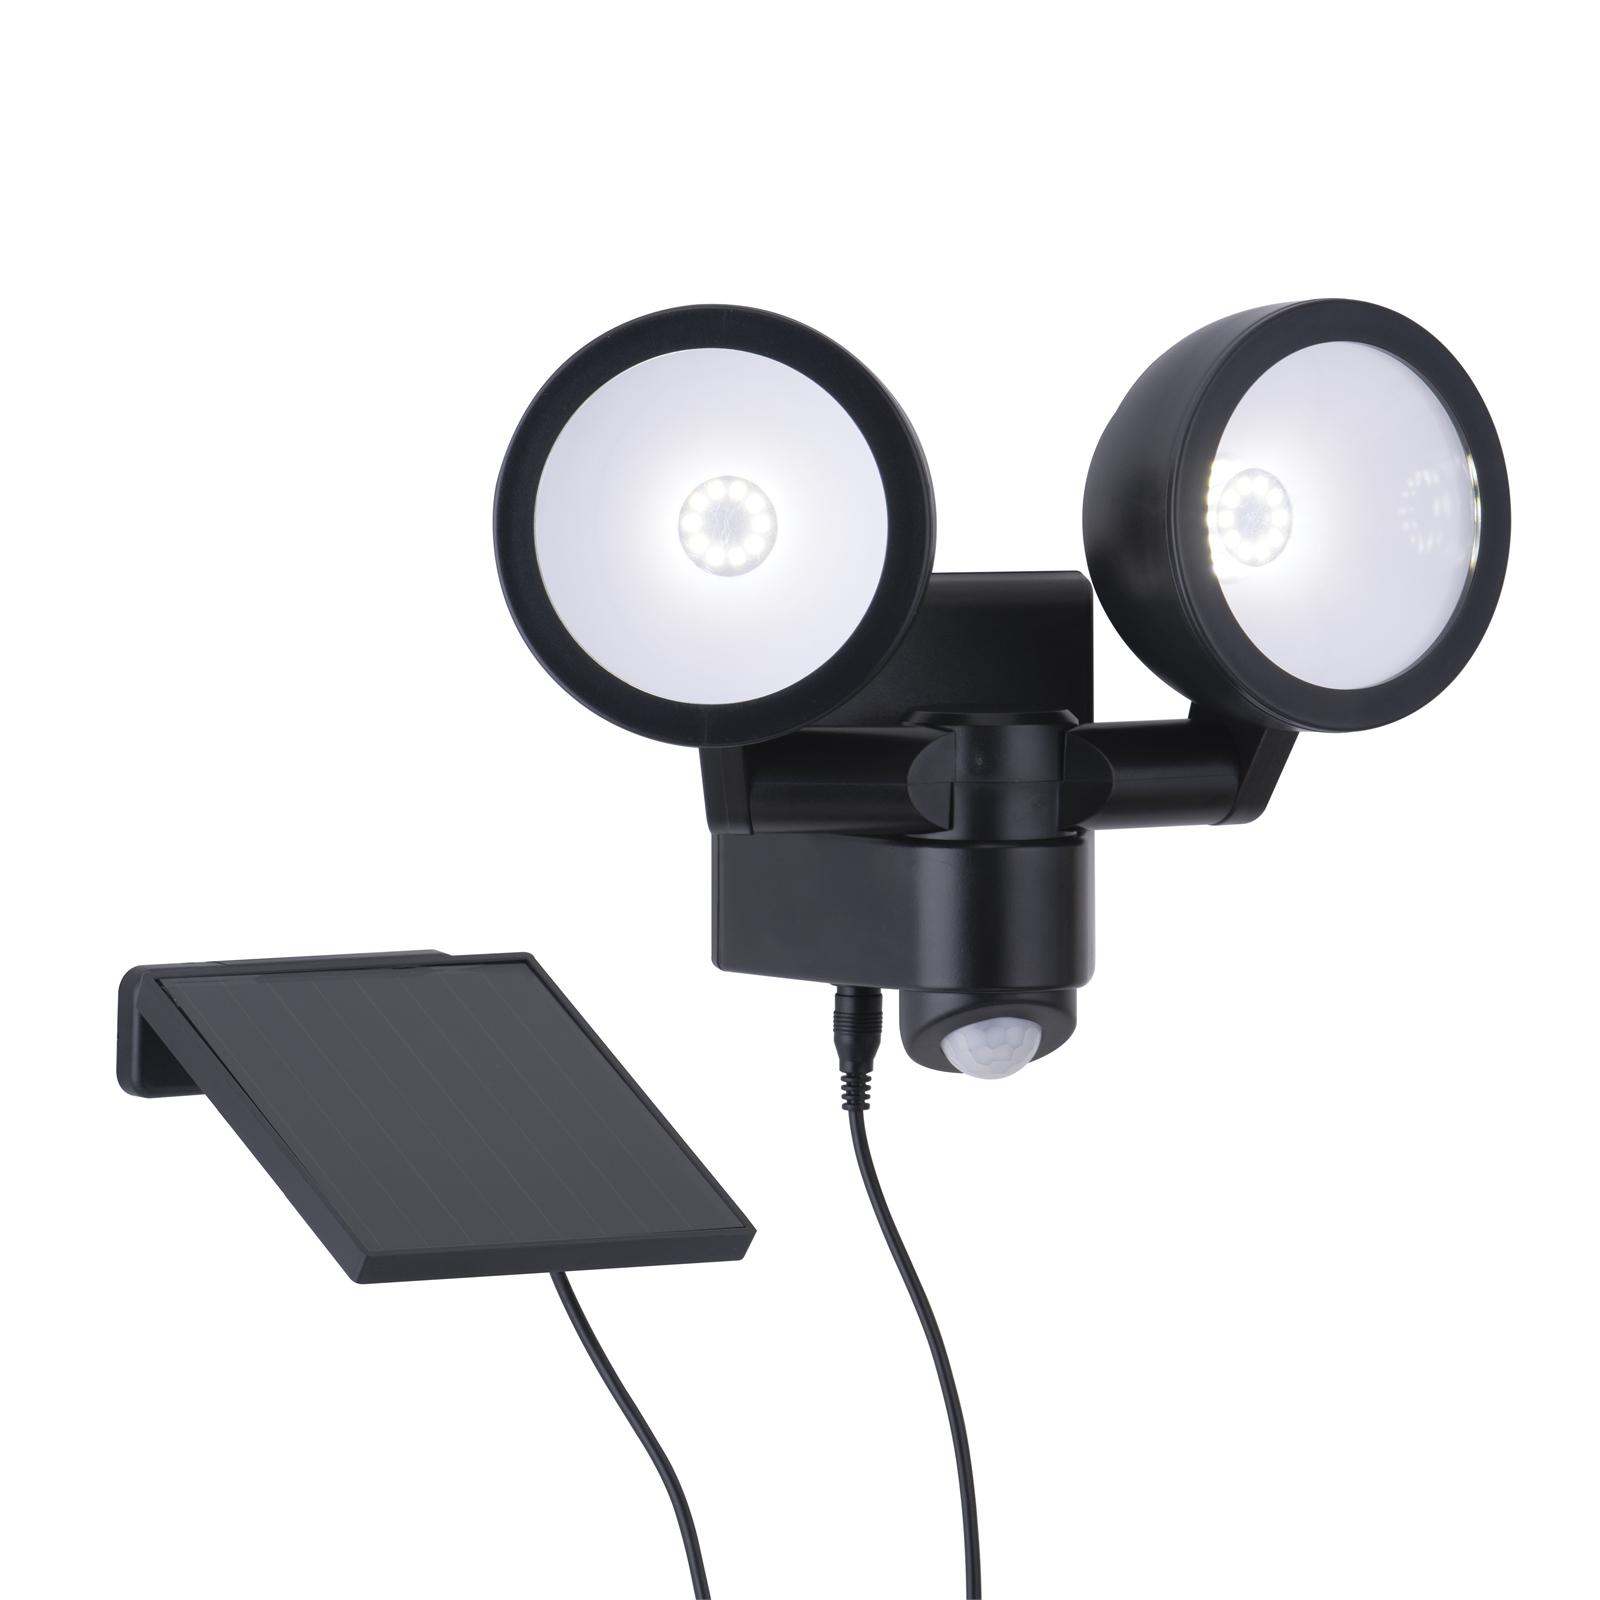 Arlec 330 Lumens LED Movement Activated Sensor Security Solar Light